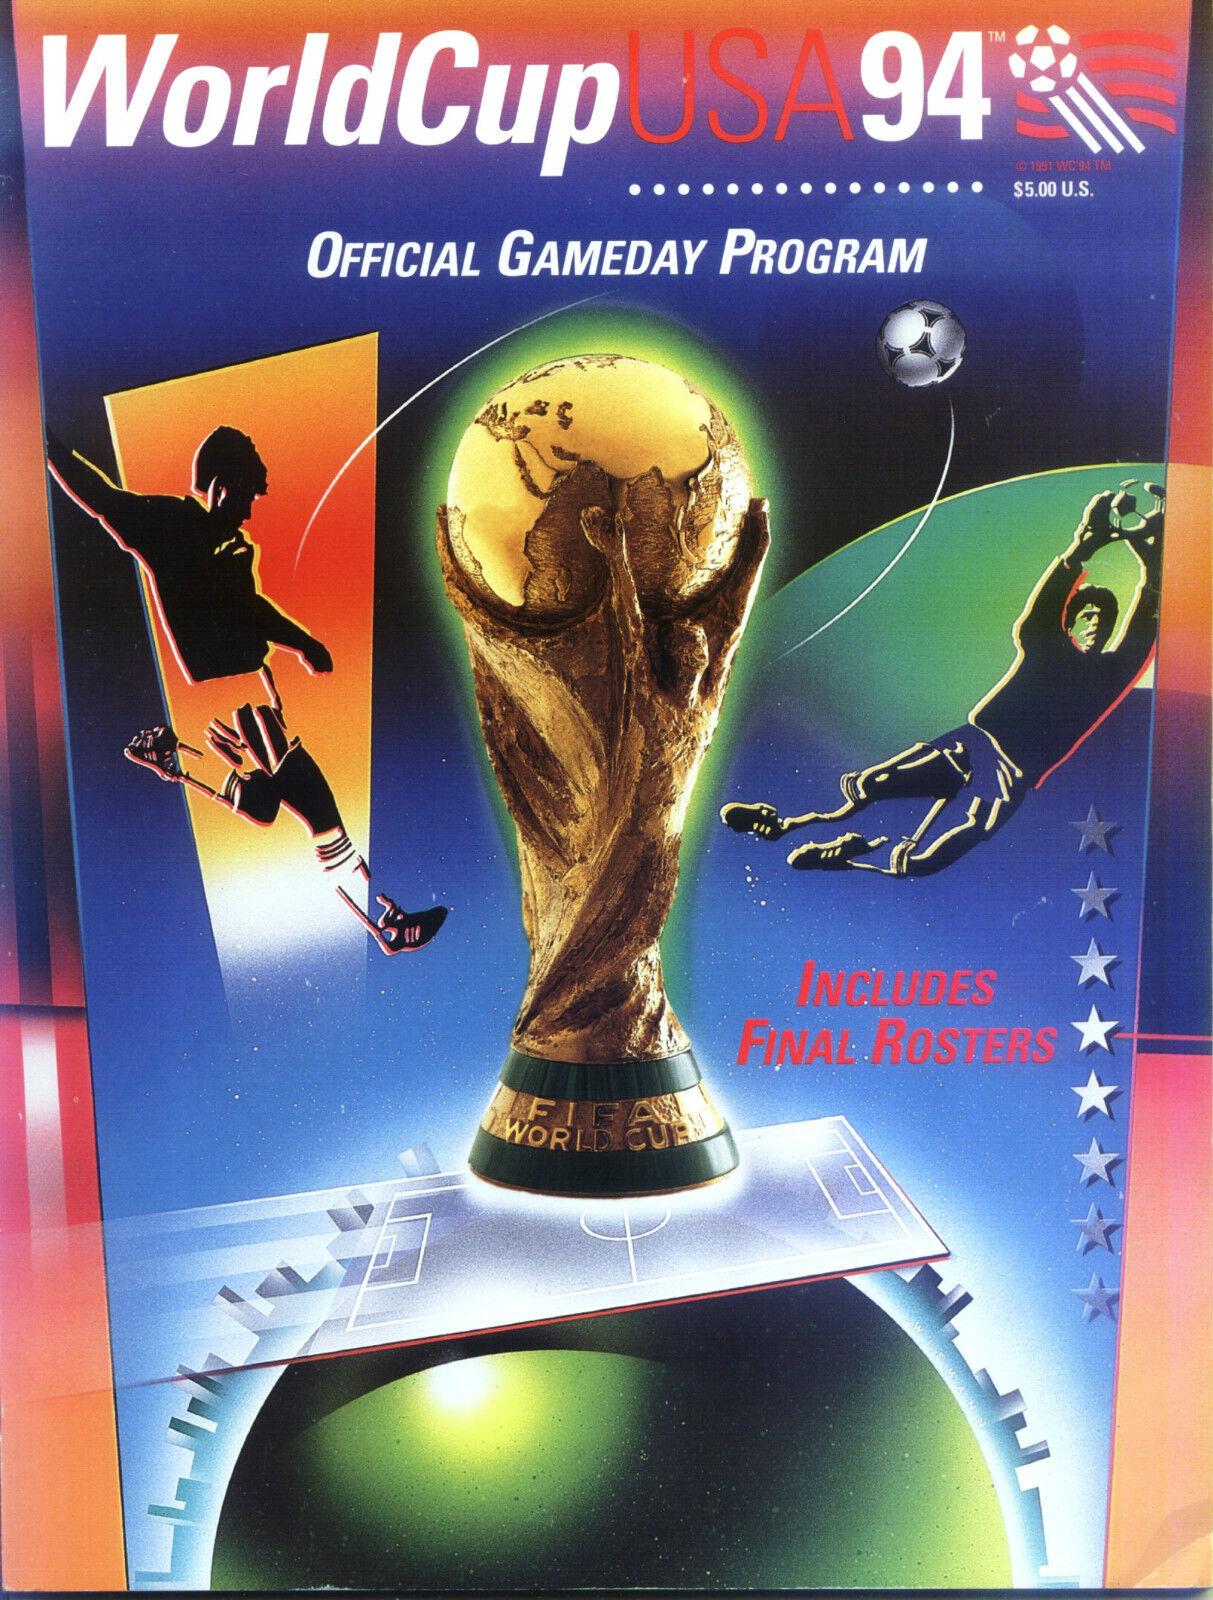 WM 1994 Gameday - World Championship USA - Official Gameday 1994 Programme - Washington 1667ea